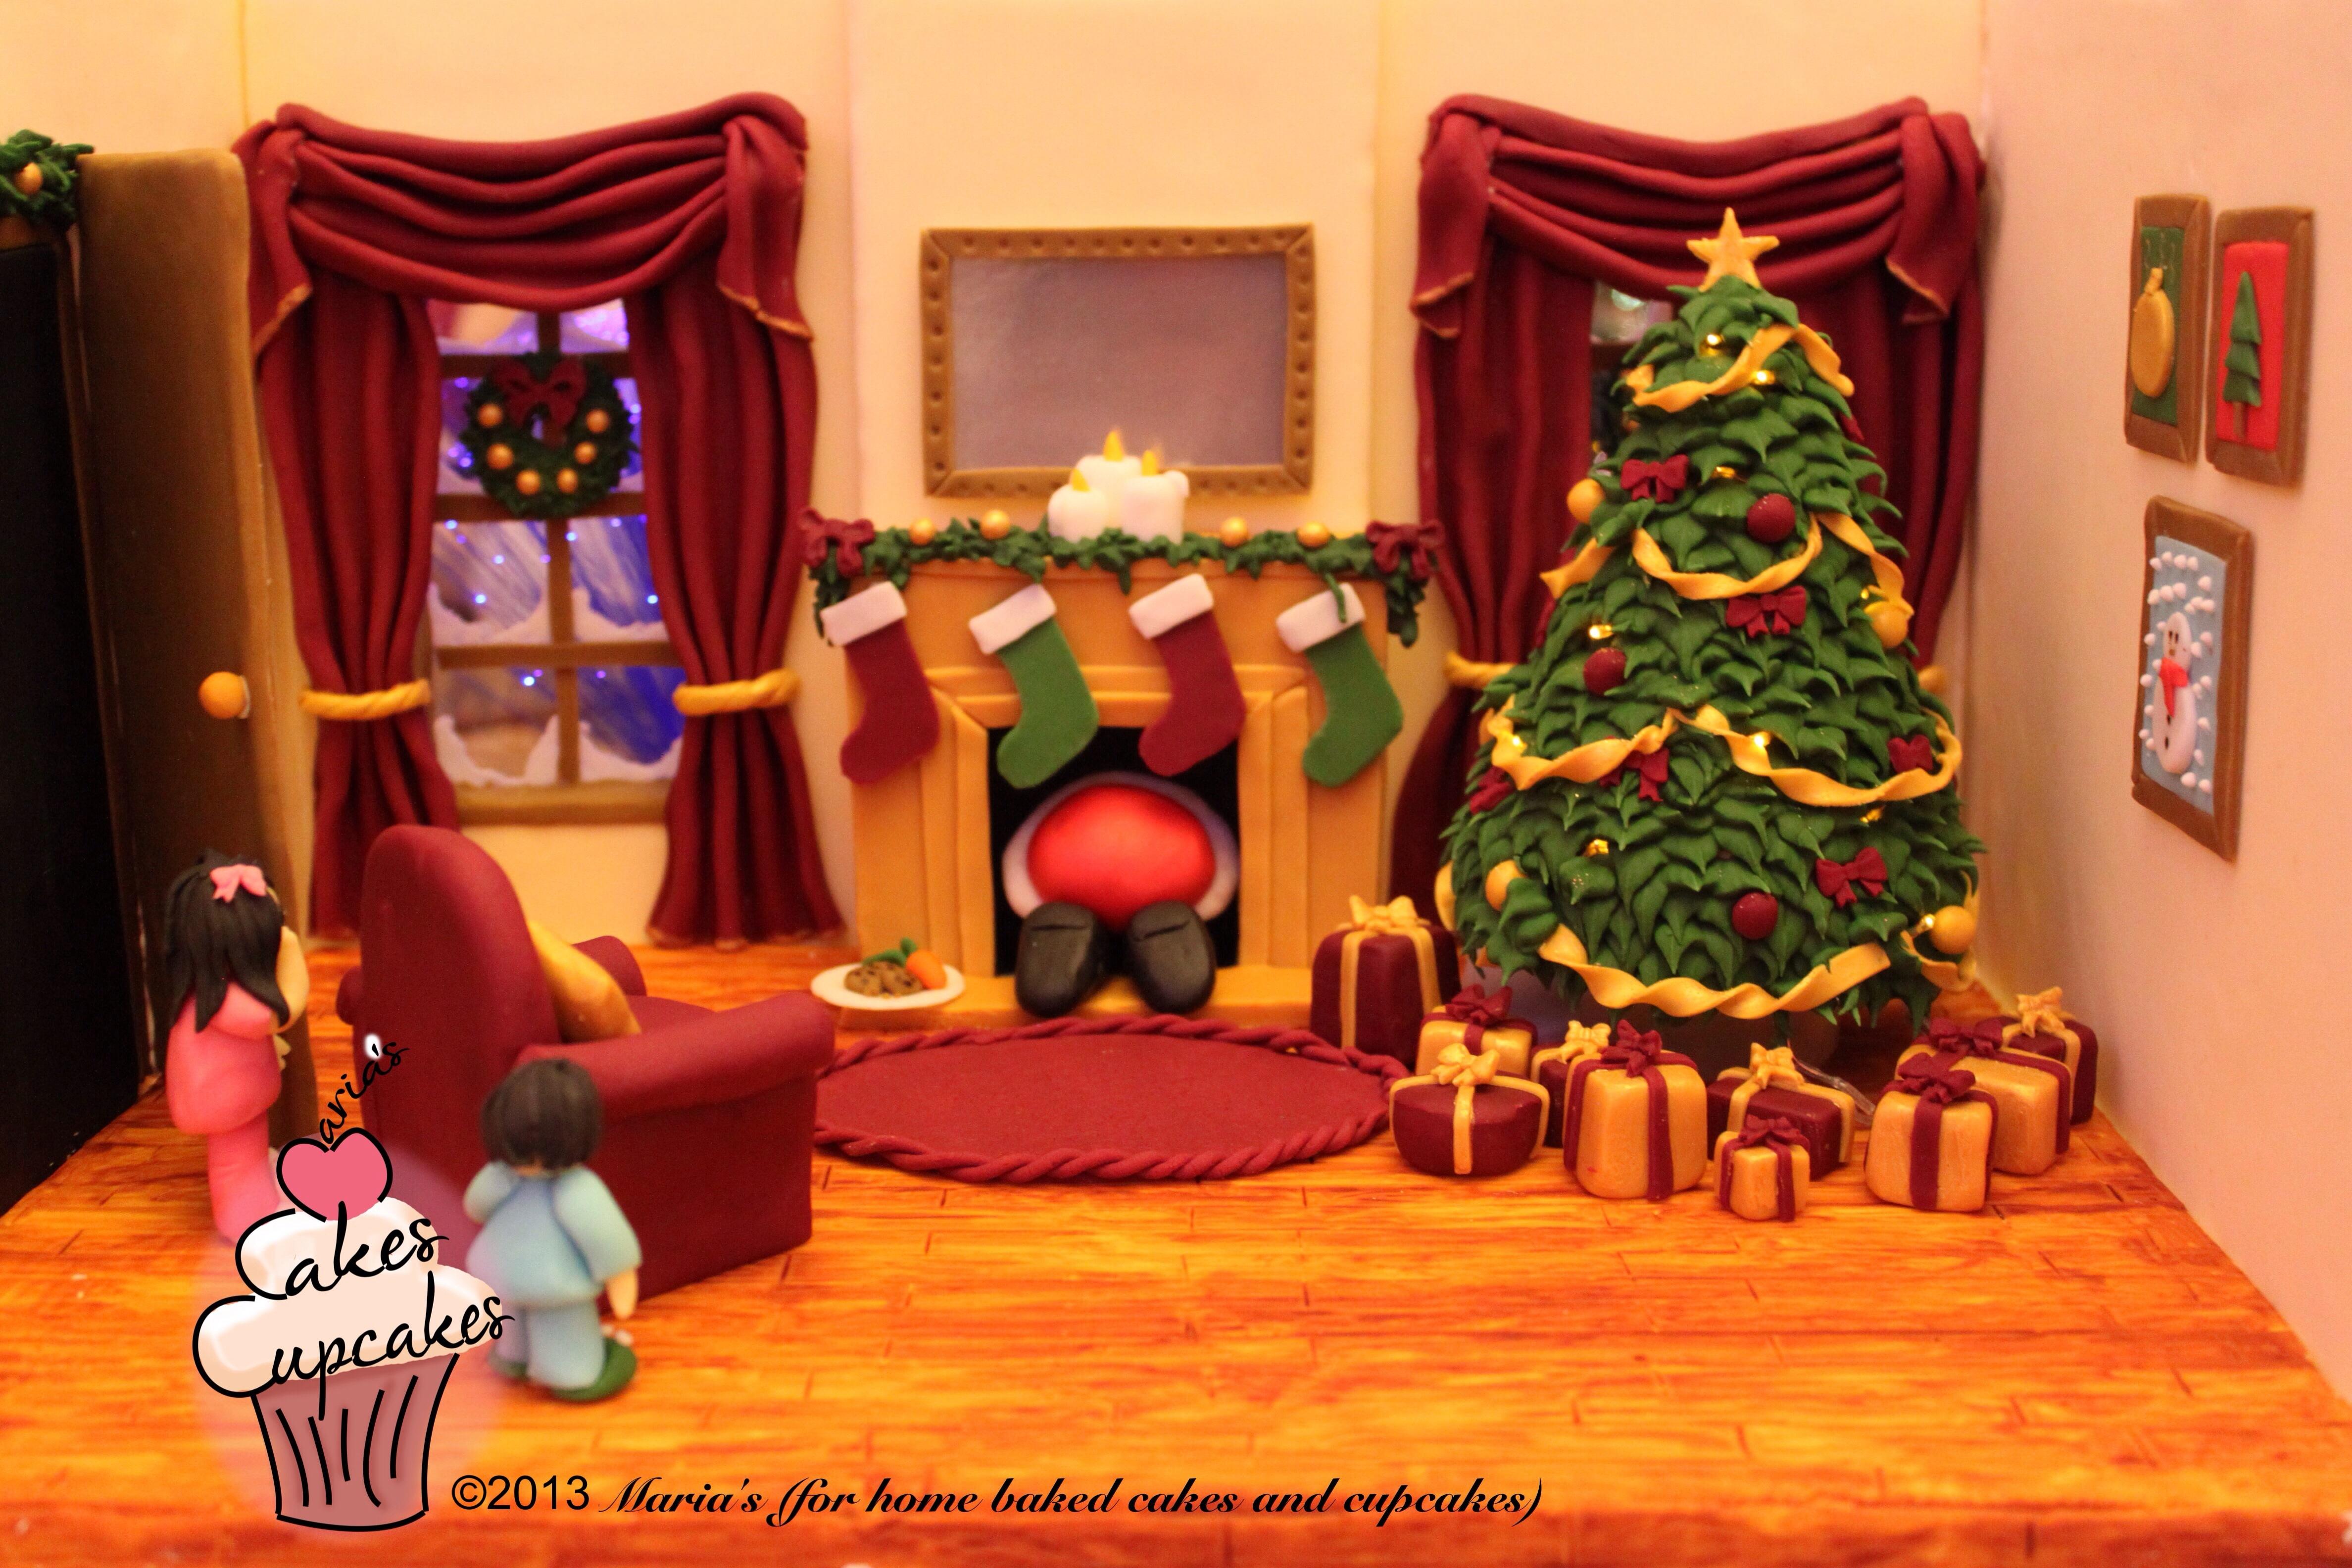 Cake Decorating Room : The Night Before Christmas Christmas Cake 2013 The Living ...